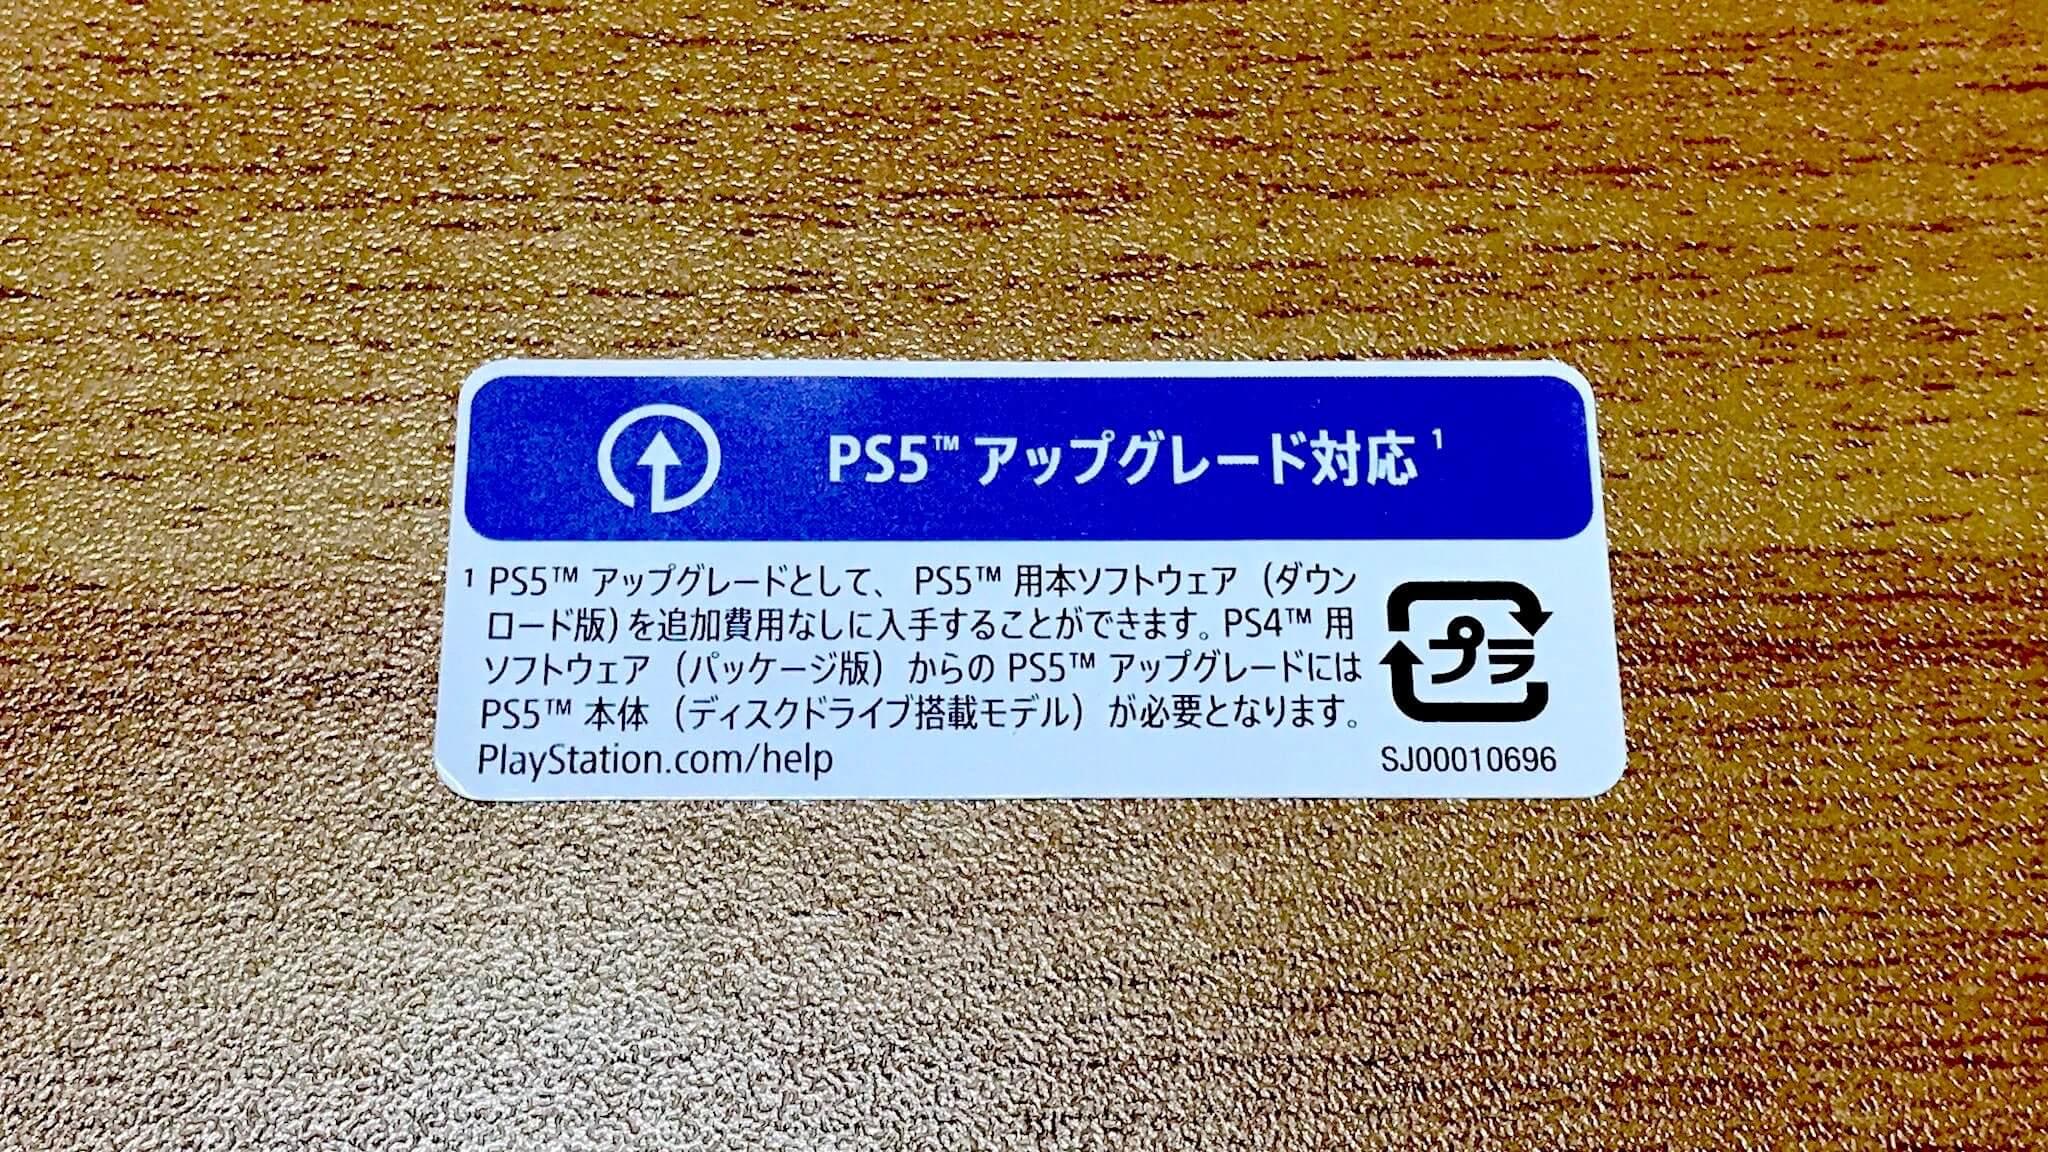 PS5アップグレード対応の表示シール